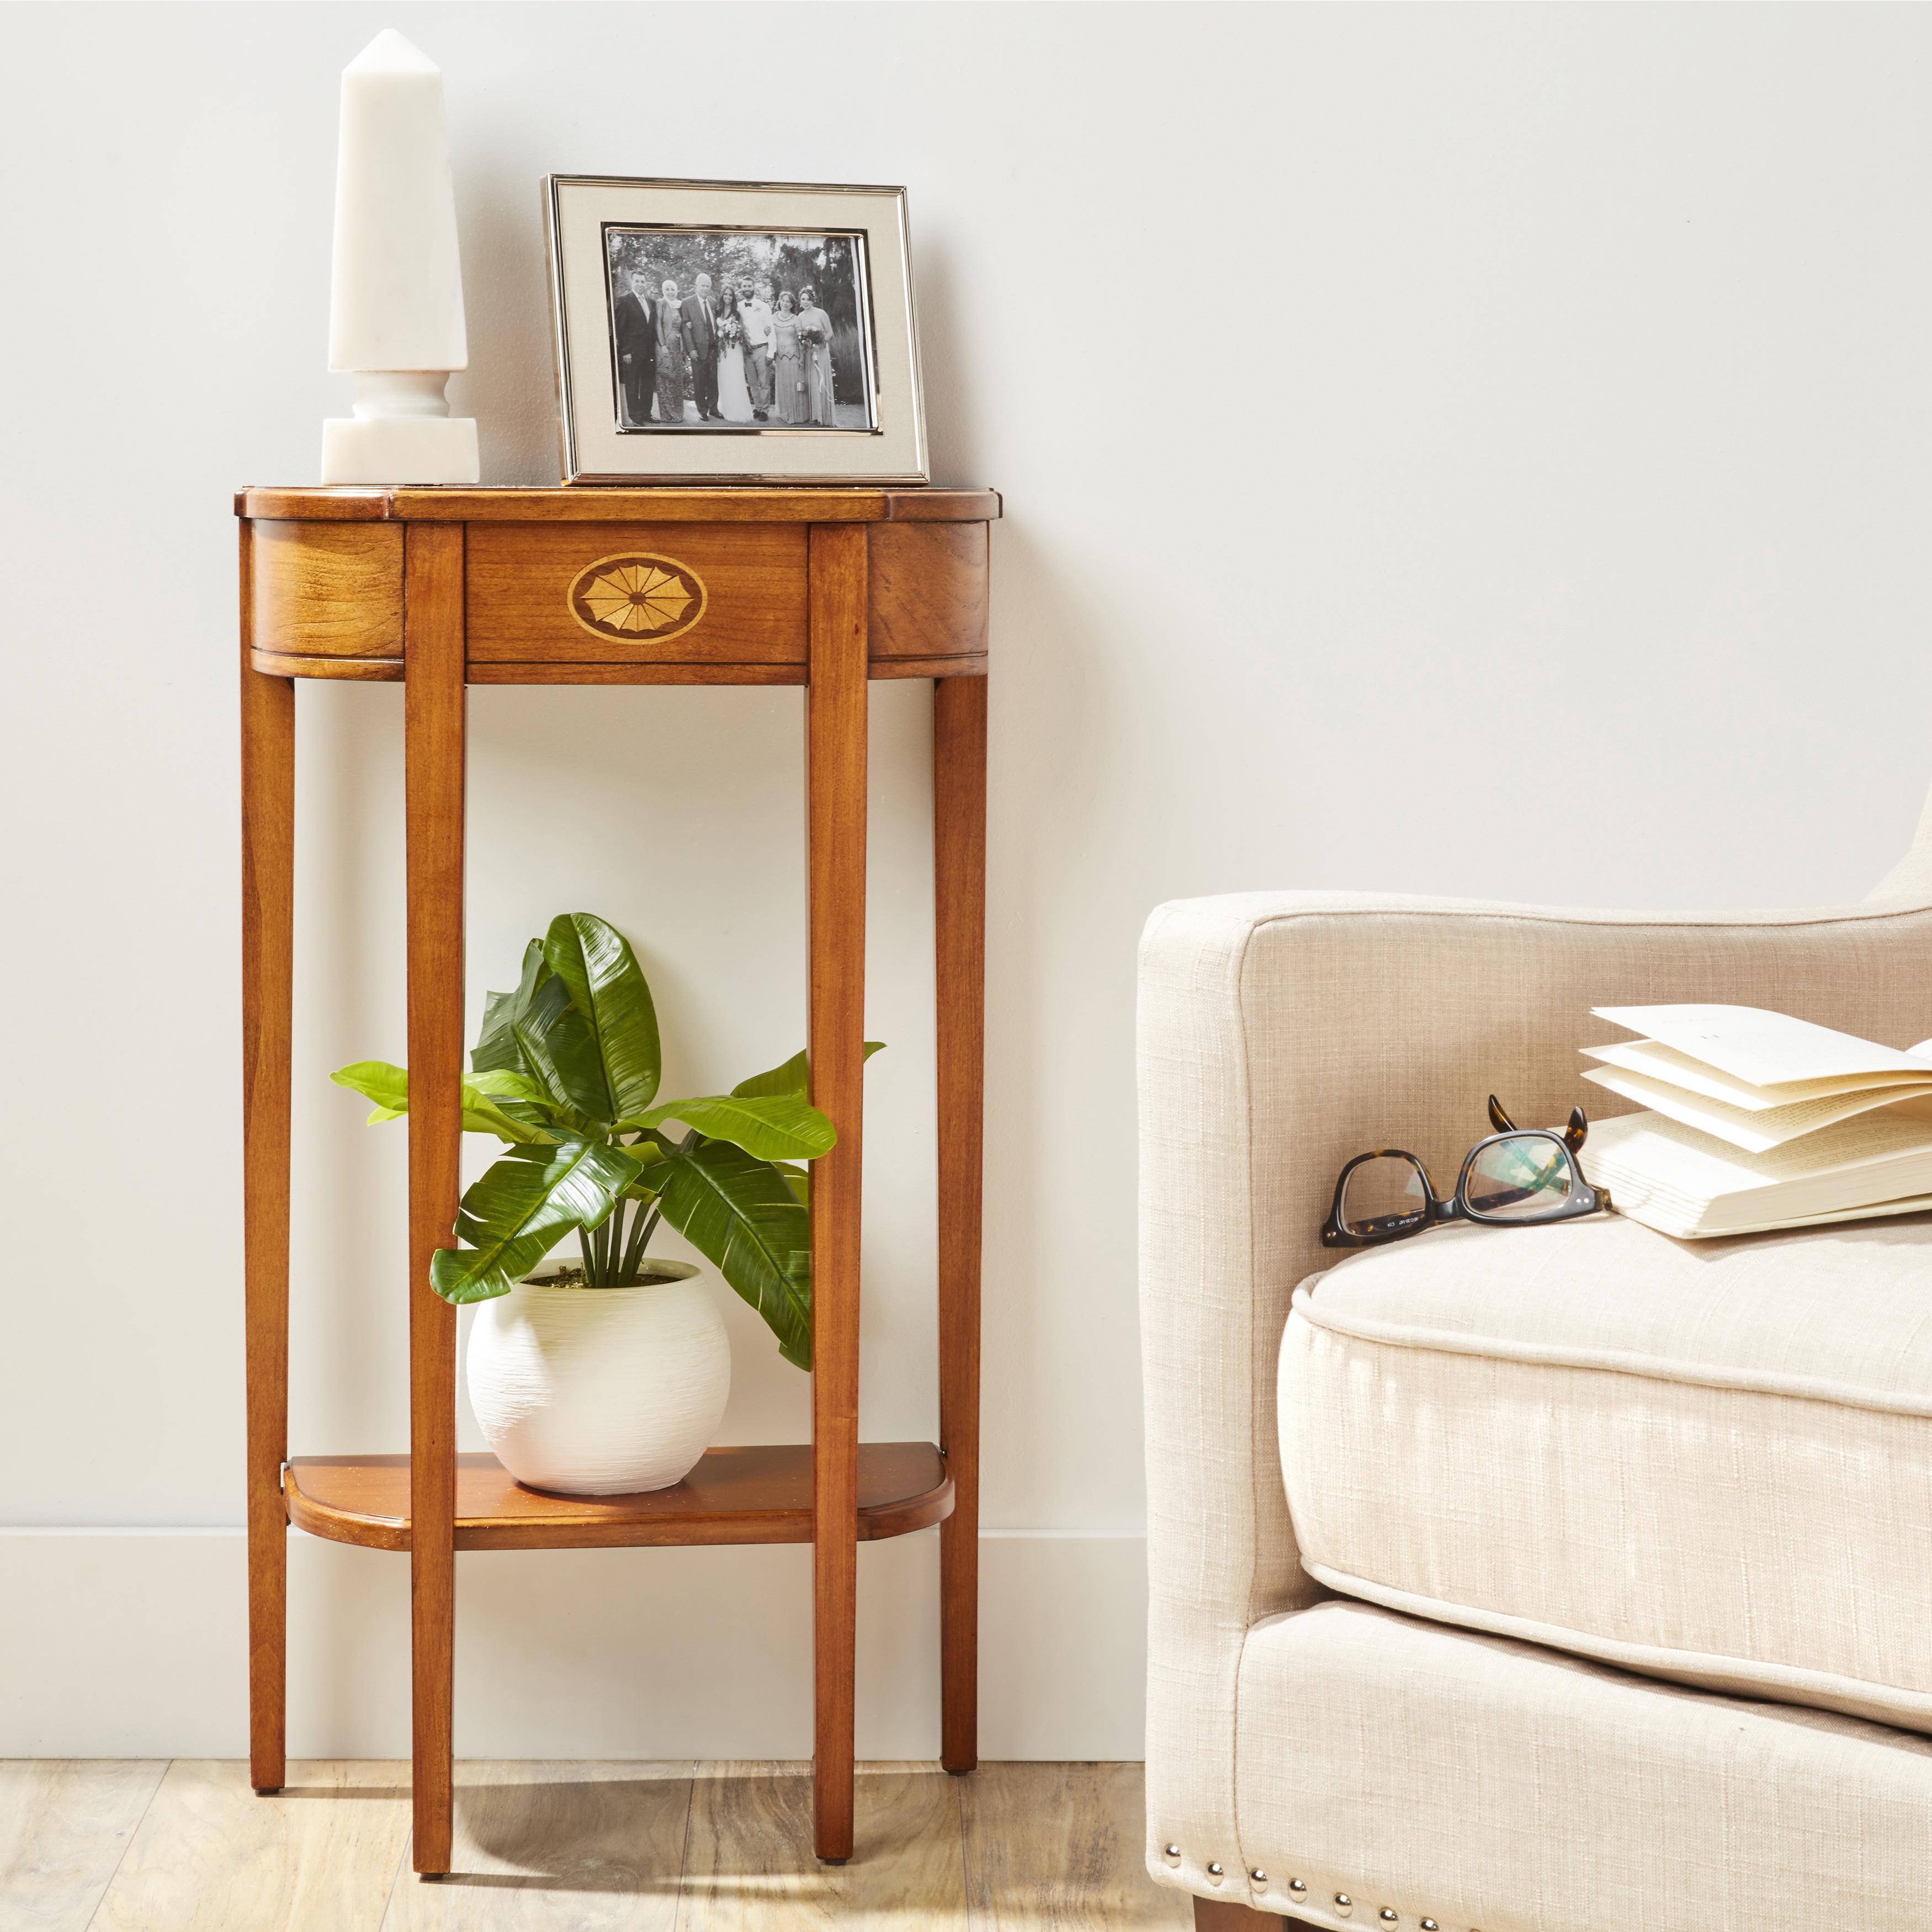 Butler Wendell Olive Ash Burl Demilune Console Table - Medium Brown (Medium Brown)